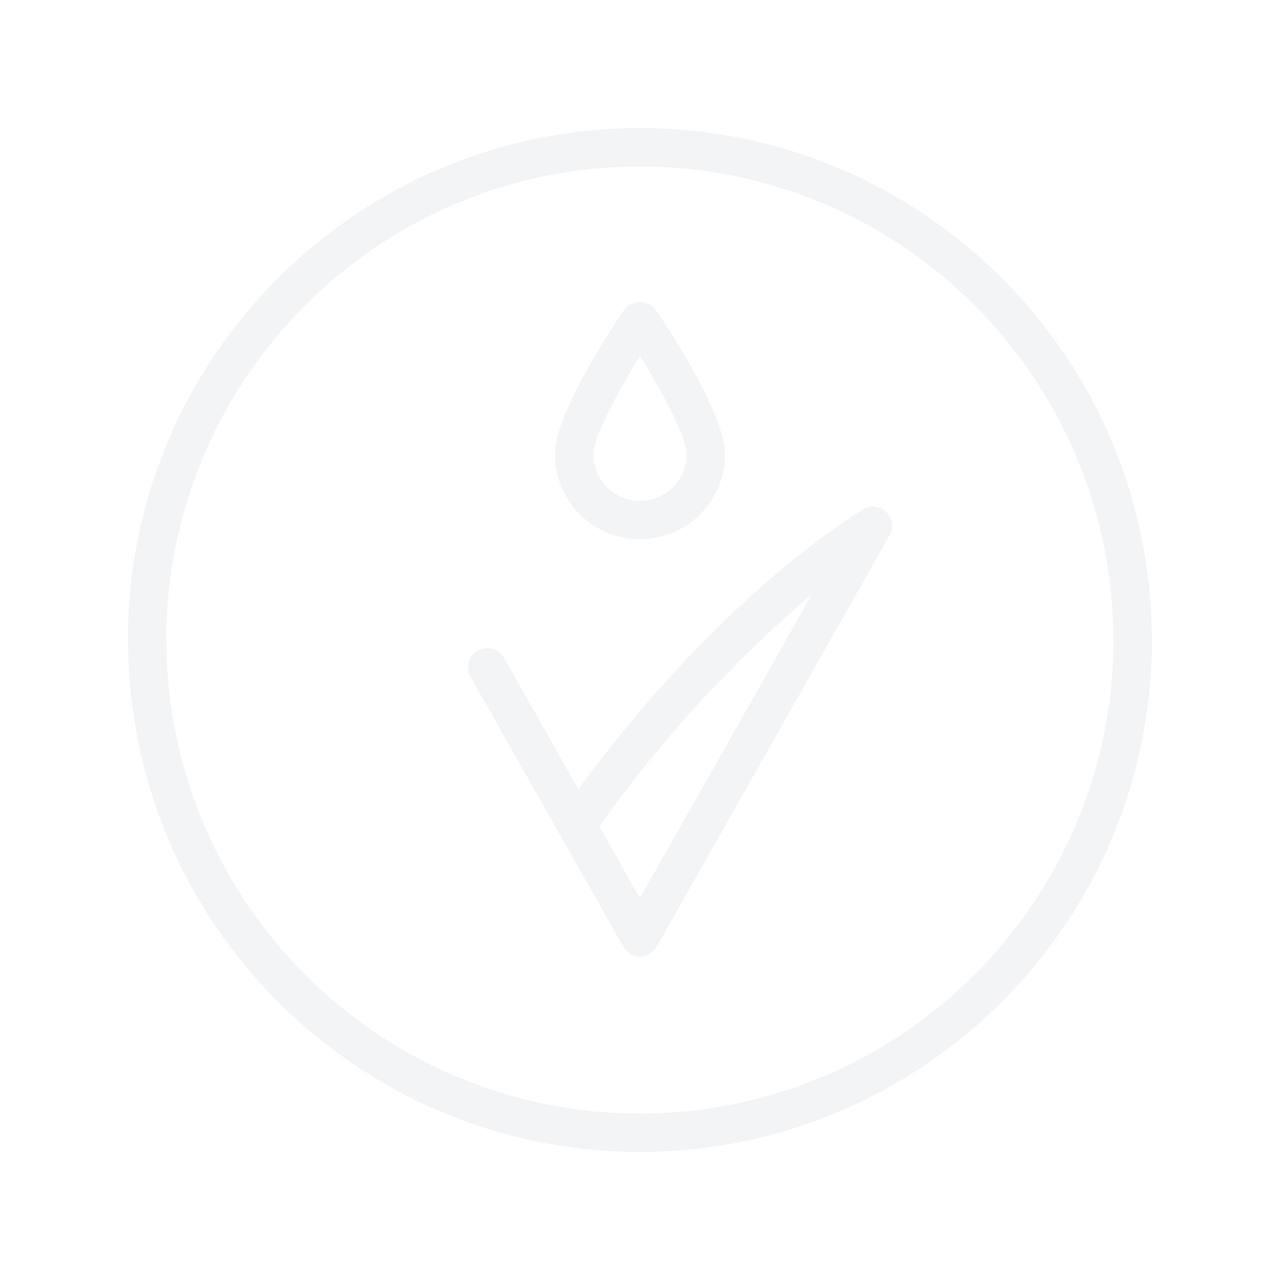 LA ROCHE-POSAY Serozinc Spray 150ml